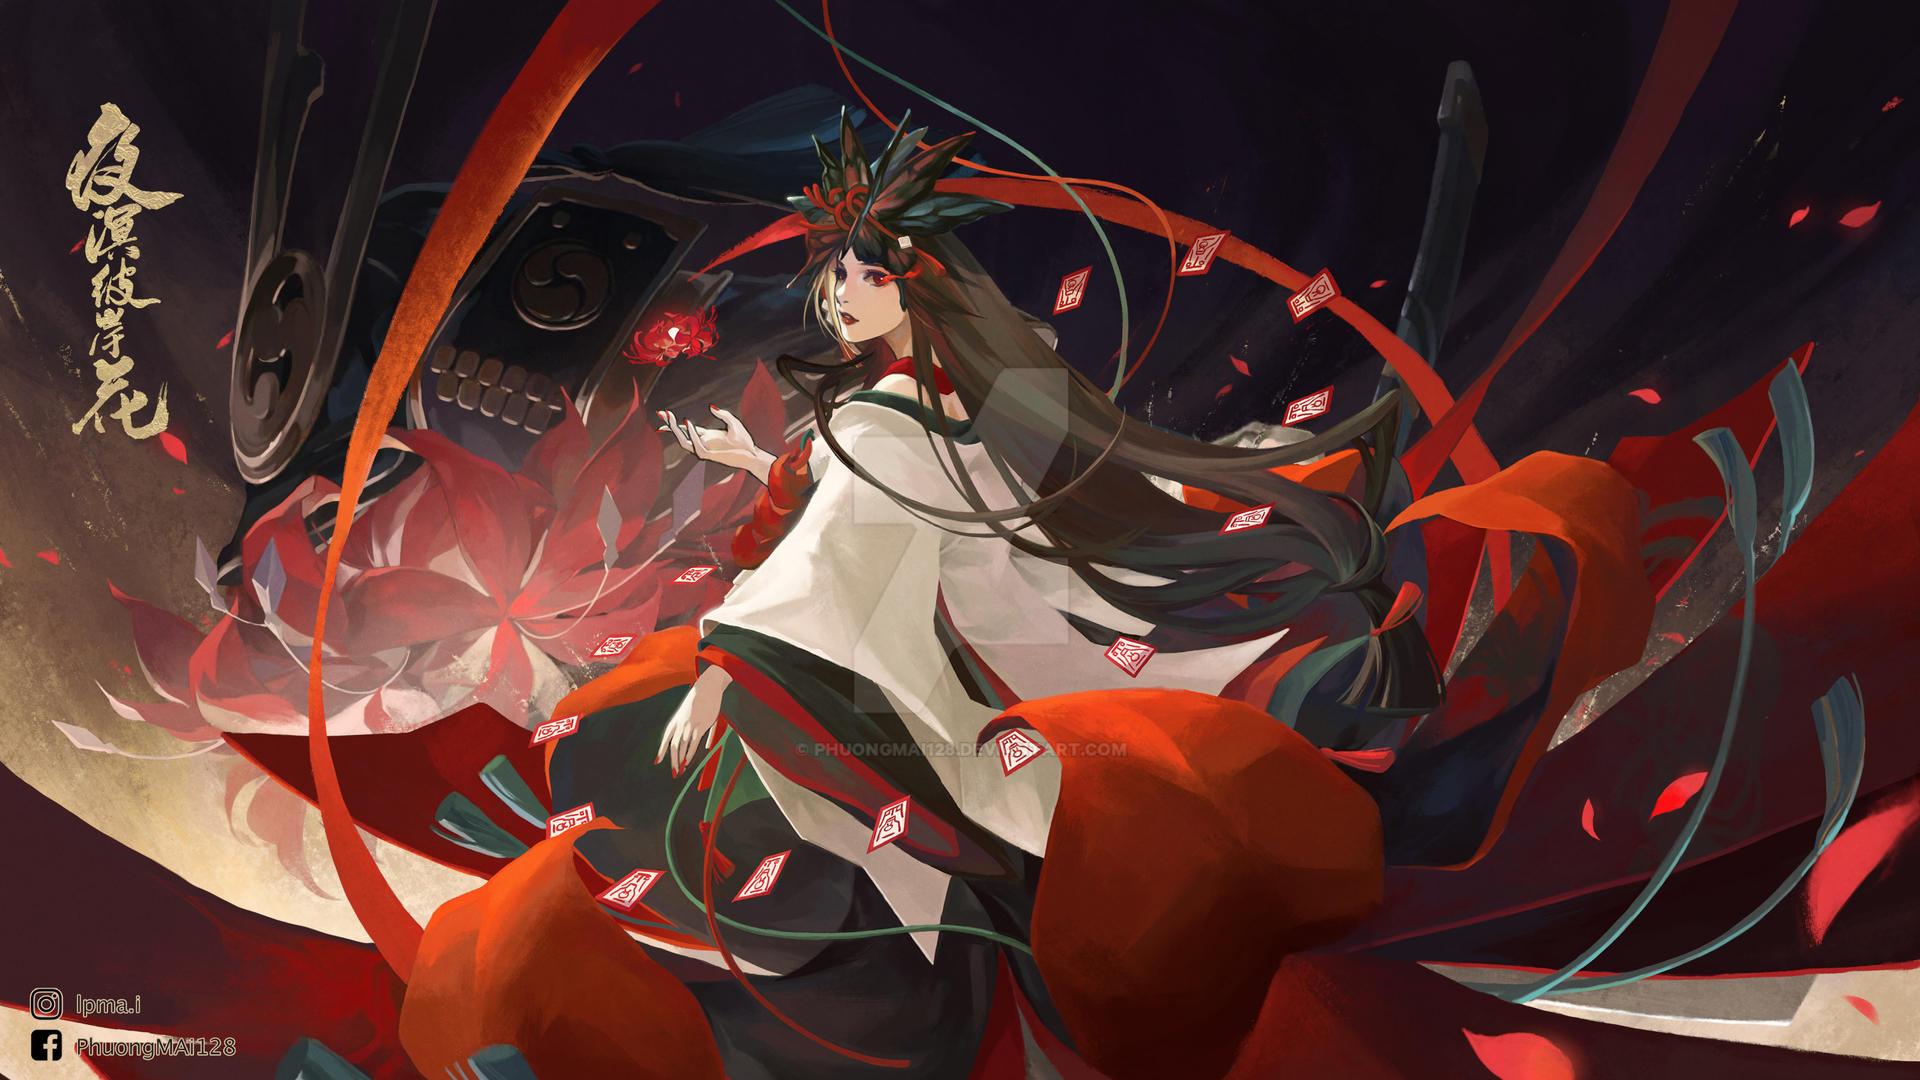 Yomei Higanbana